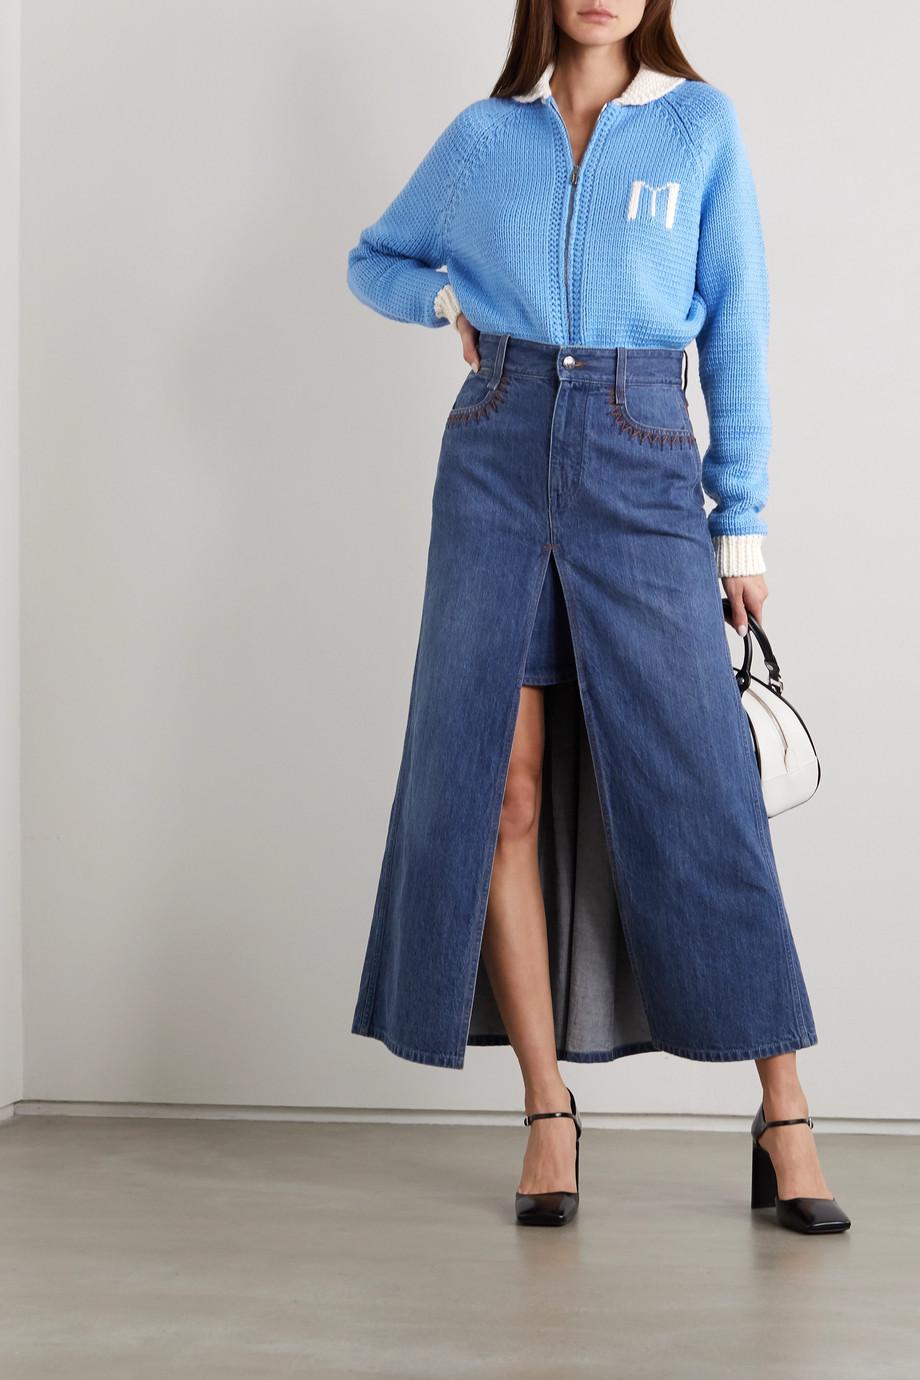 Miu Miu Intarsia wool bodysuit